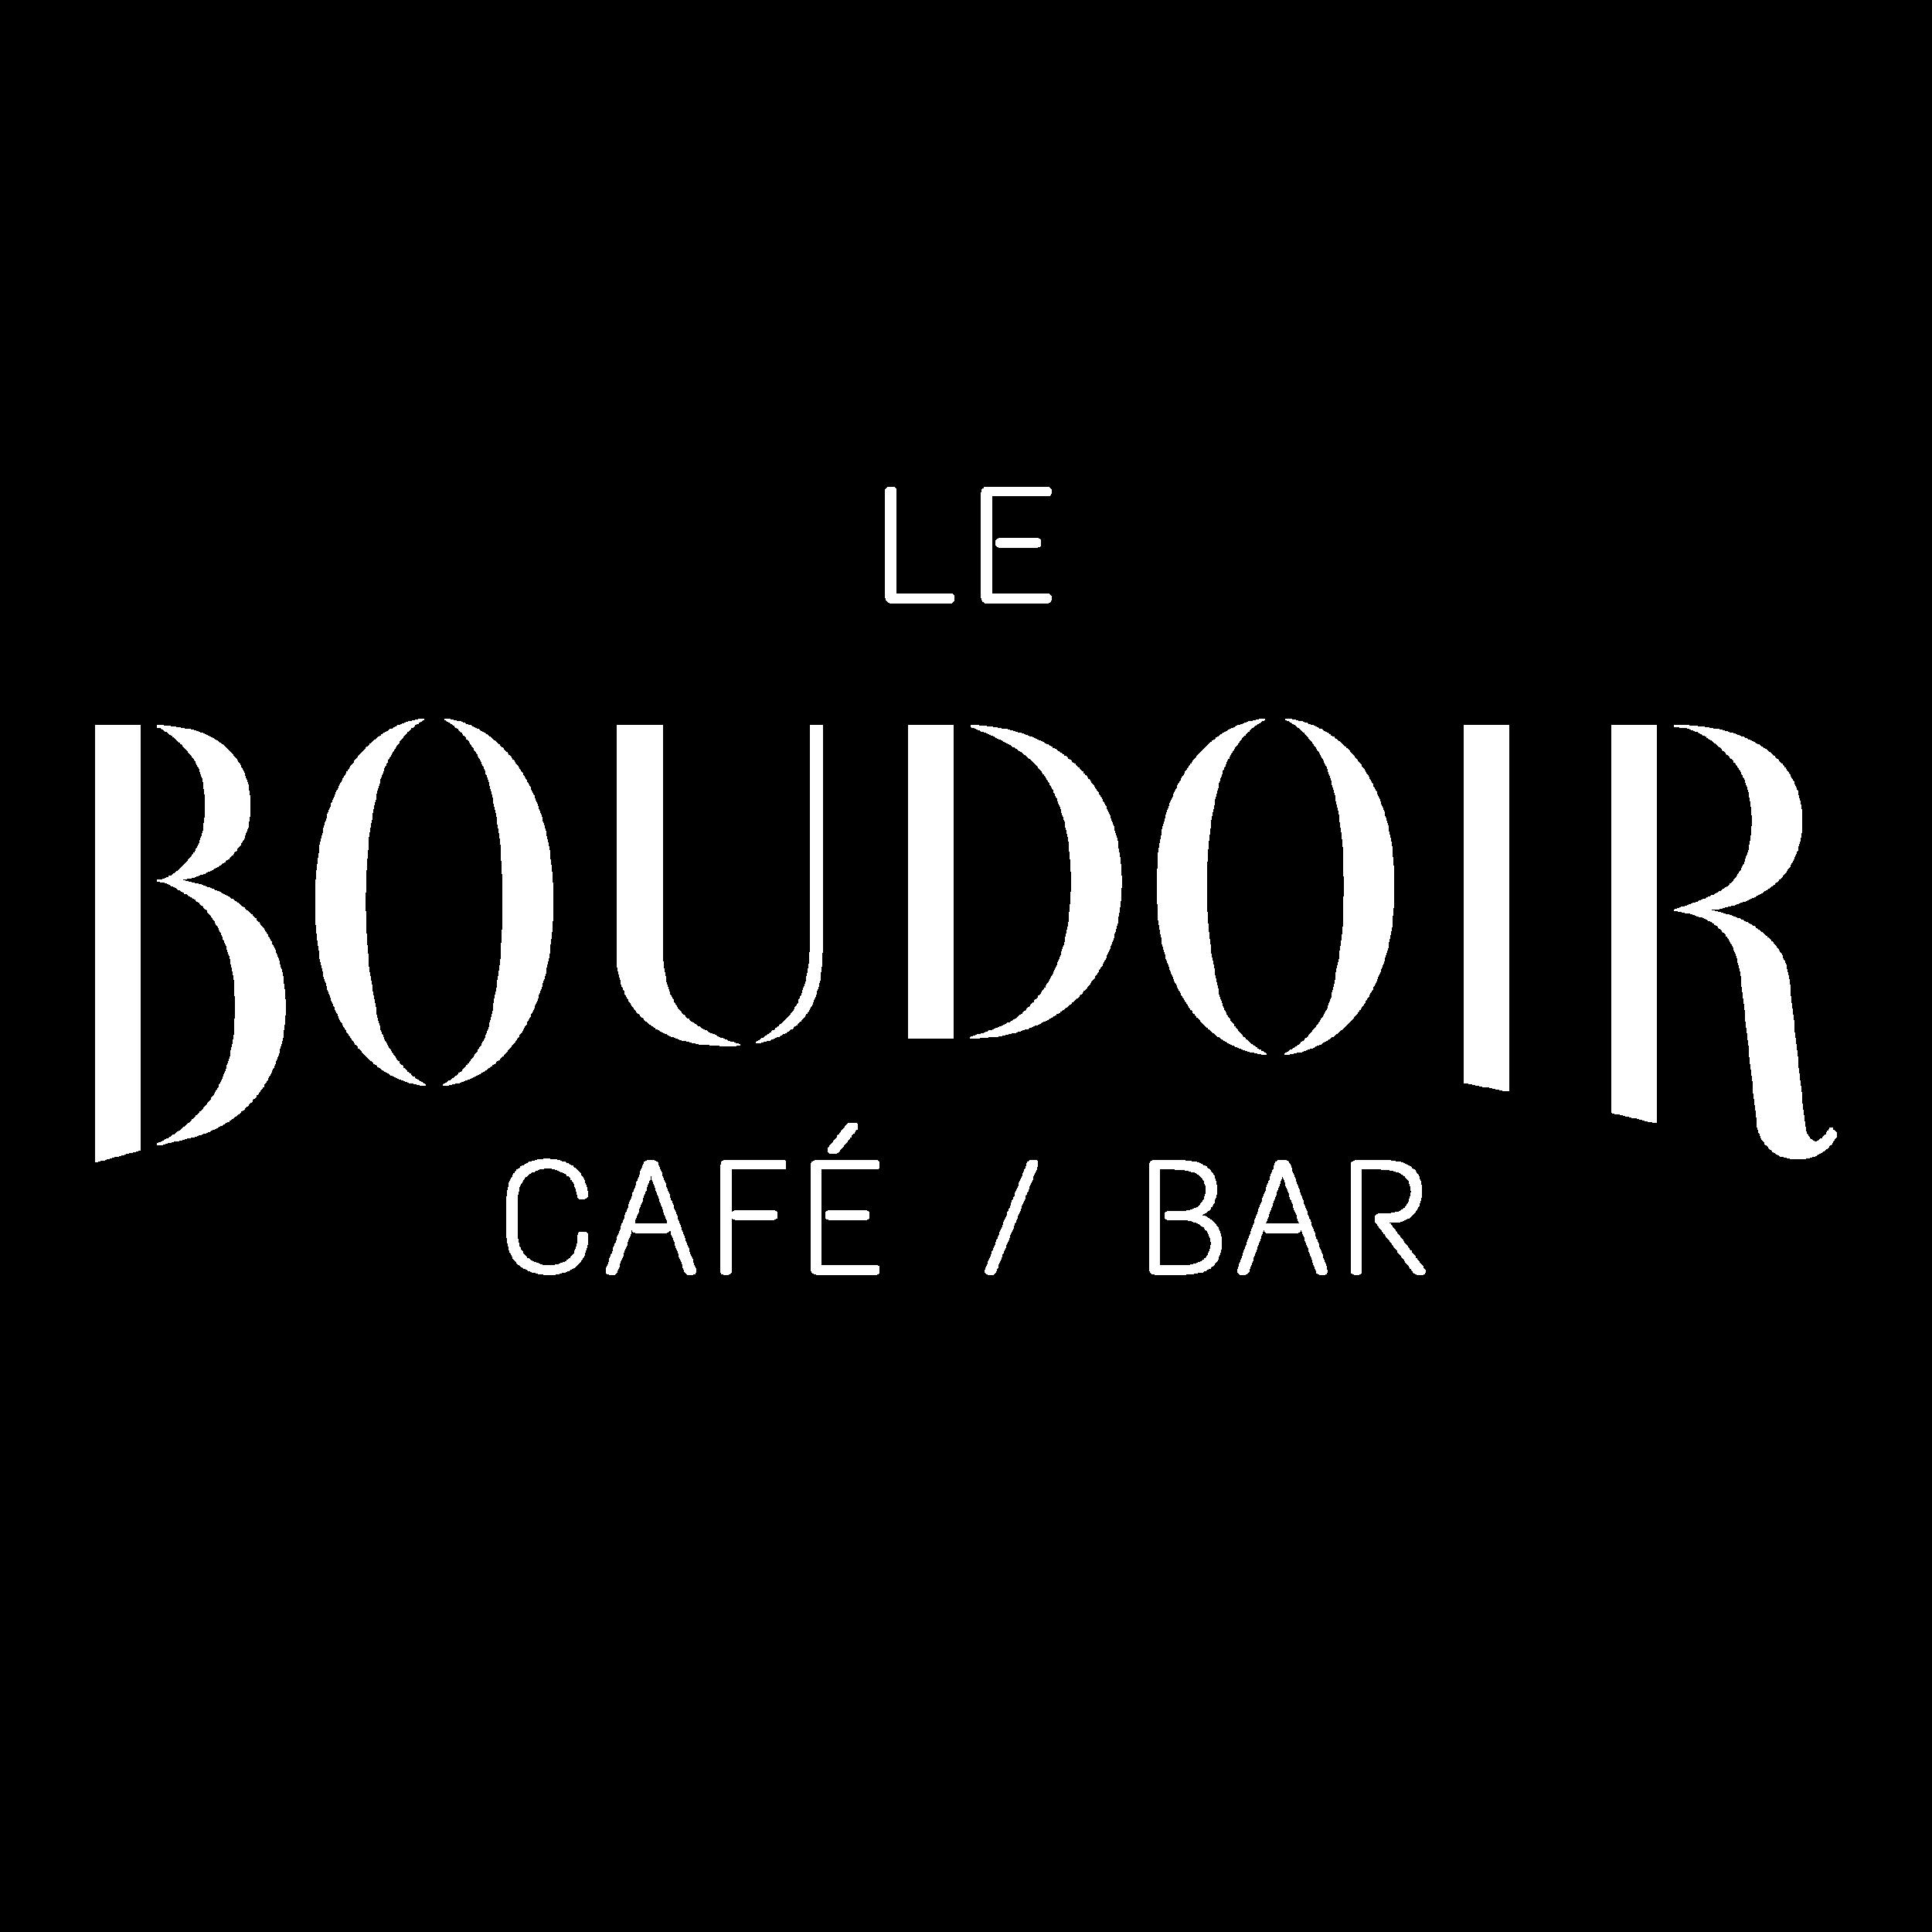 logos-boudoir6.png